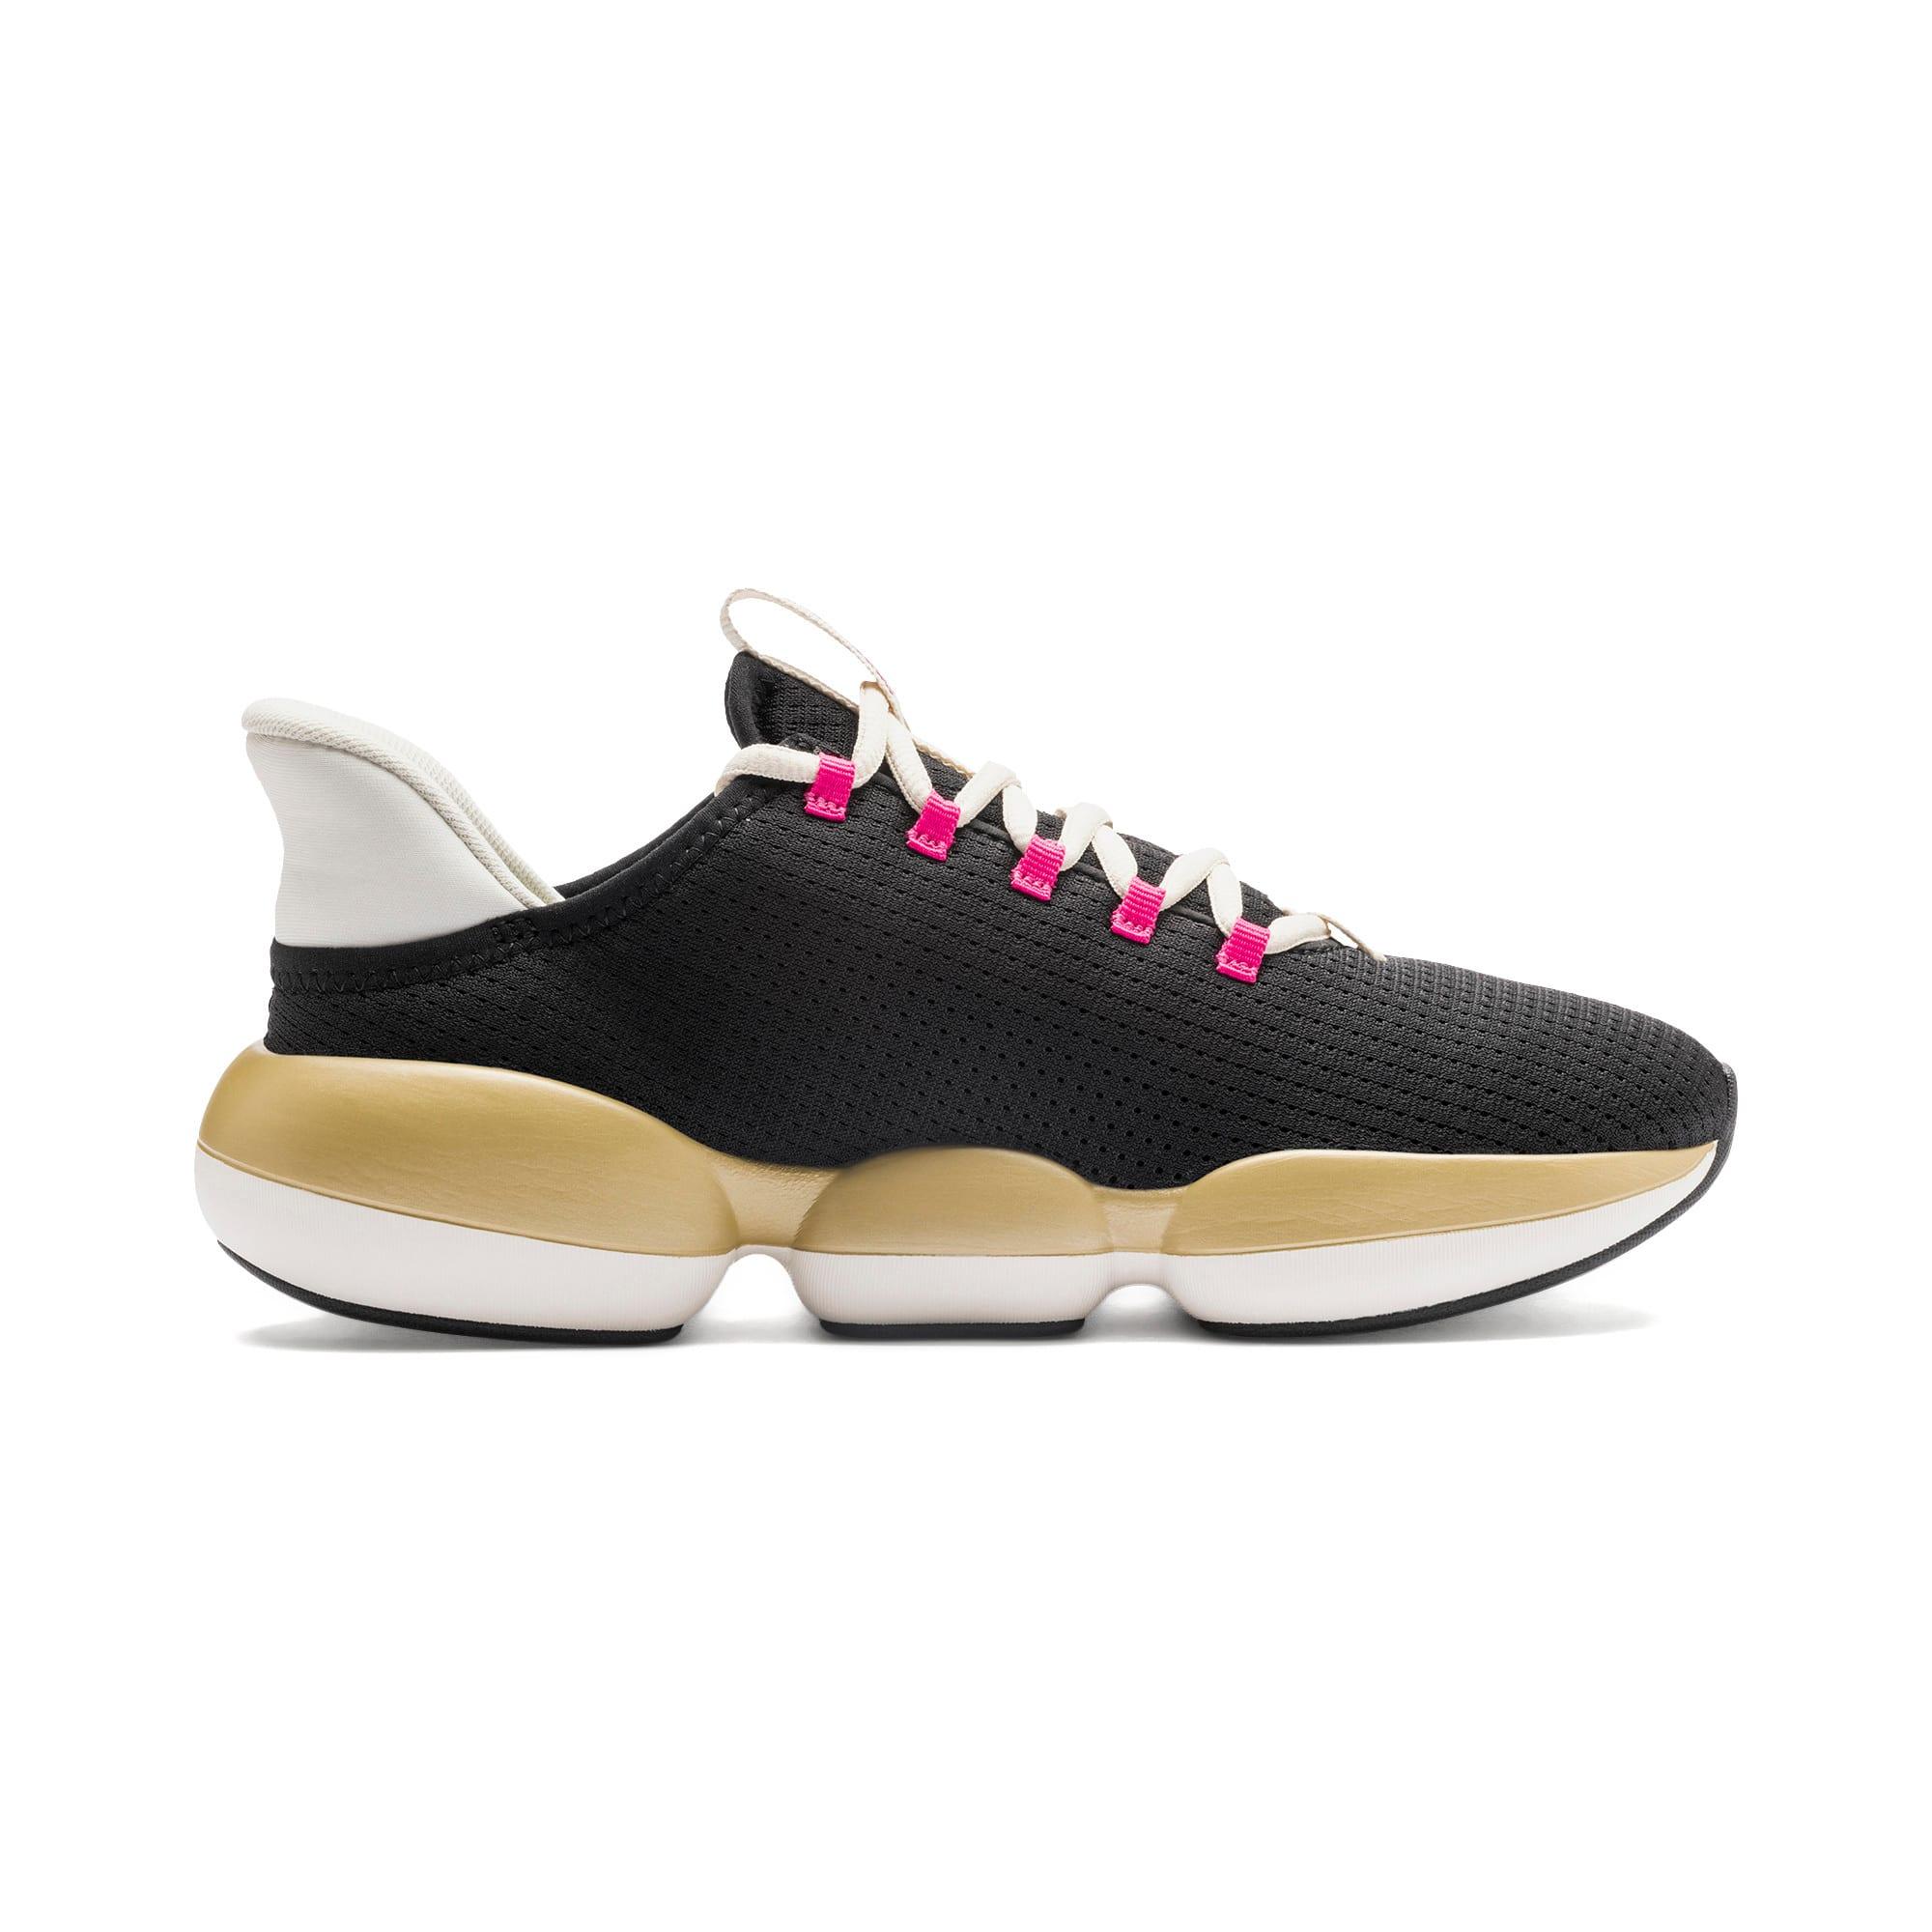 Thumbnail 5 of Mode XT Sweet Women's Training Shoes, Black- White-Purple, medium